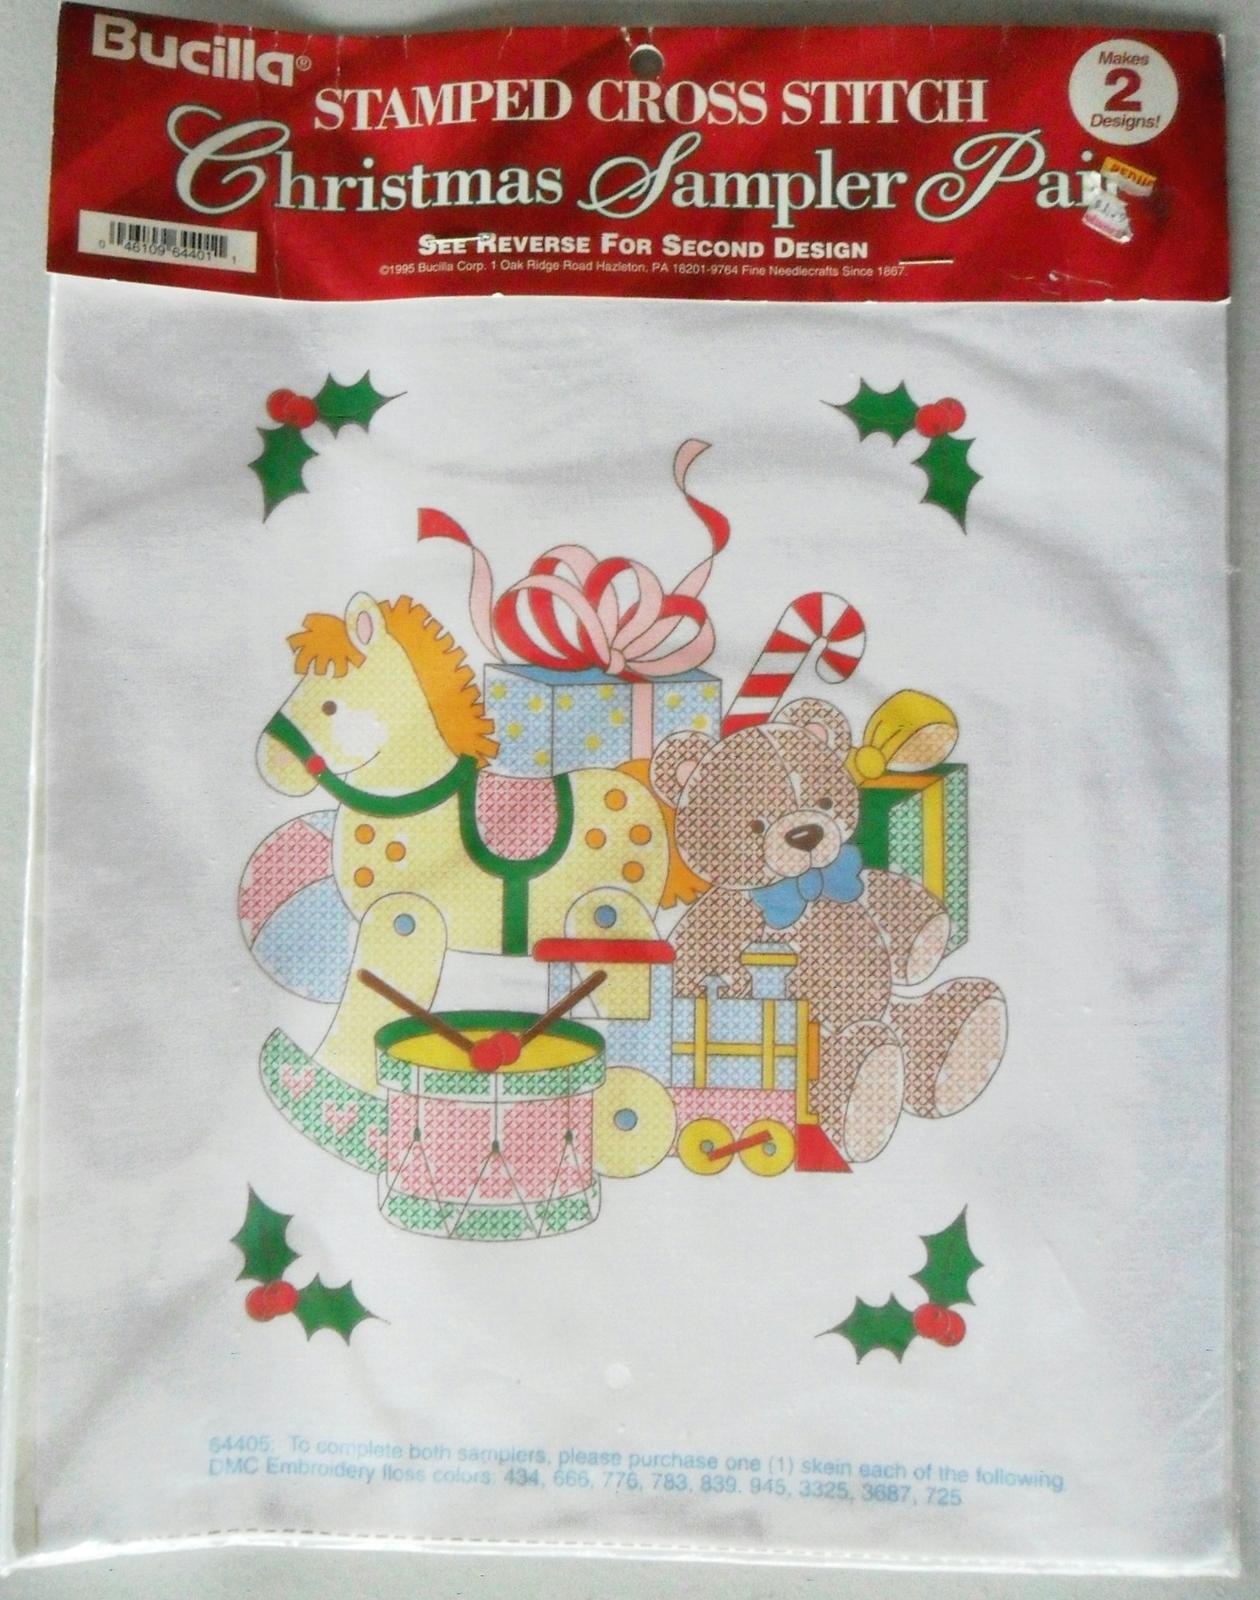 Bucilla Stamped Cross Stitch Christmas Sampler Pair Toys Stocking NIP 1995 - $4.00